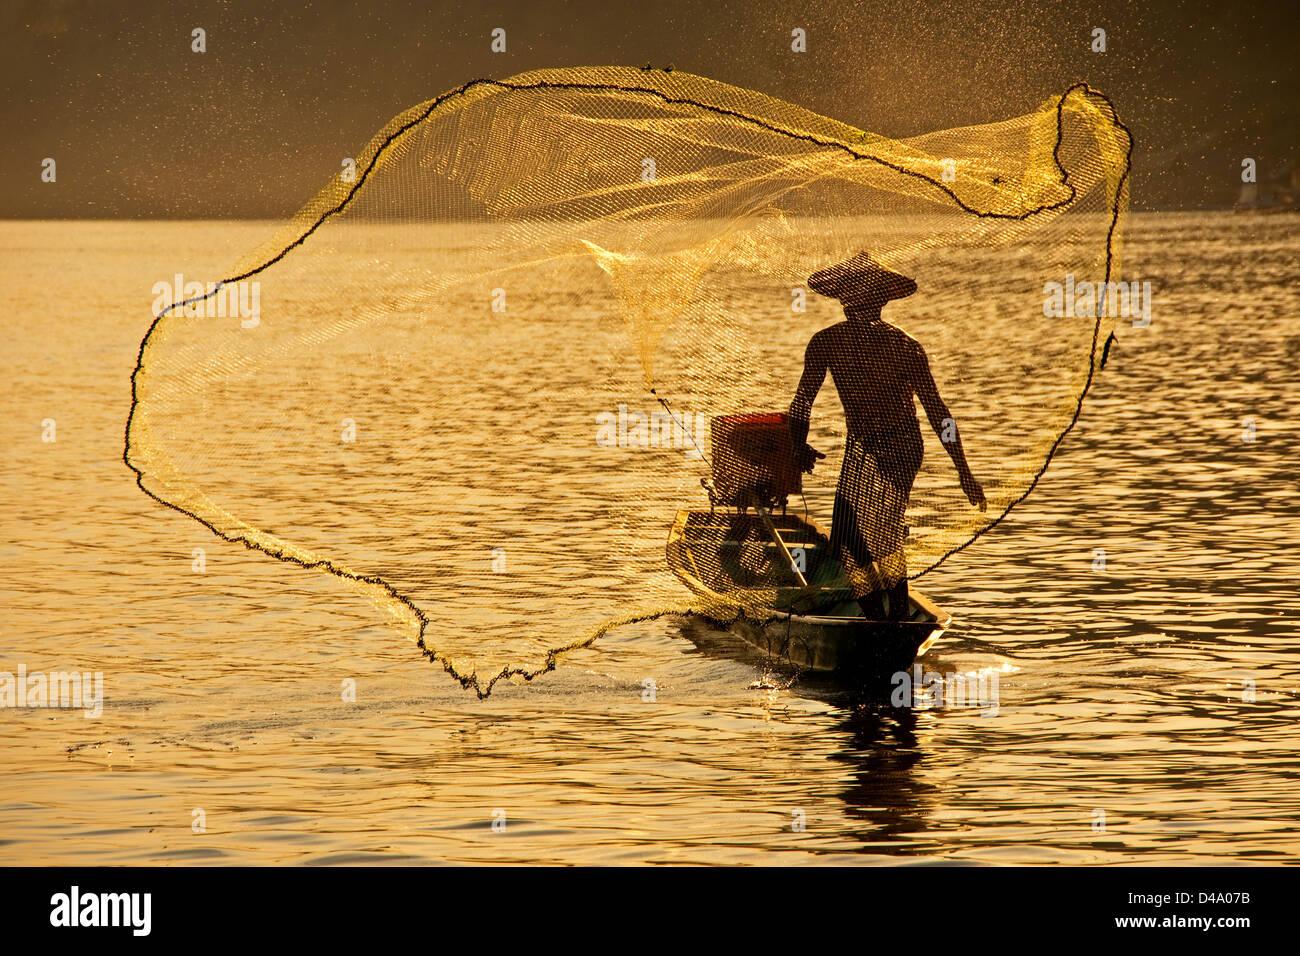 Fisherman tossing net sul fiume Mekong a Luang Prabang, Laos Immagini Stock